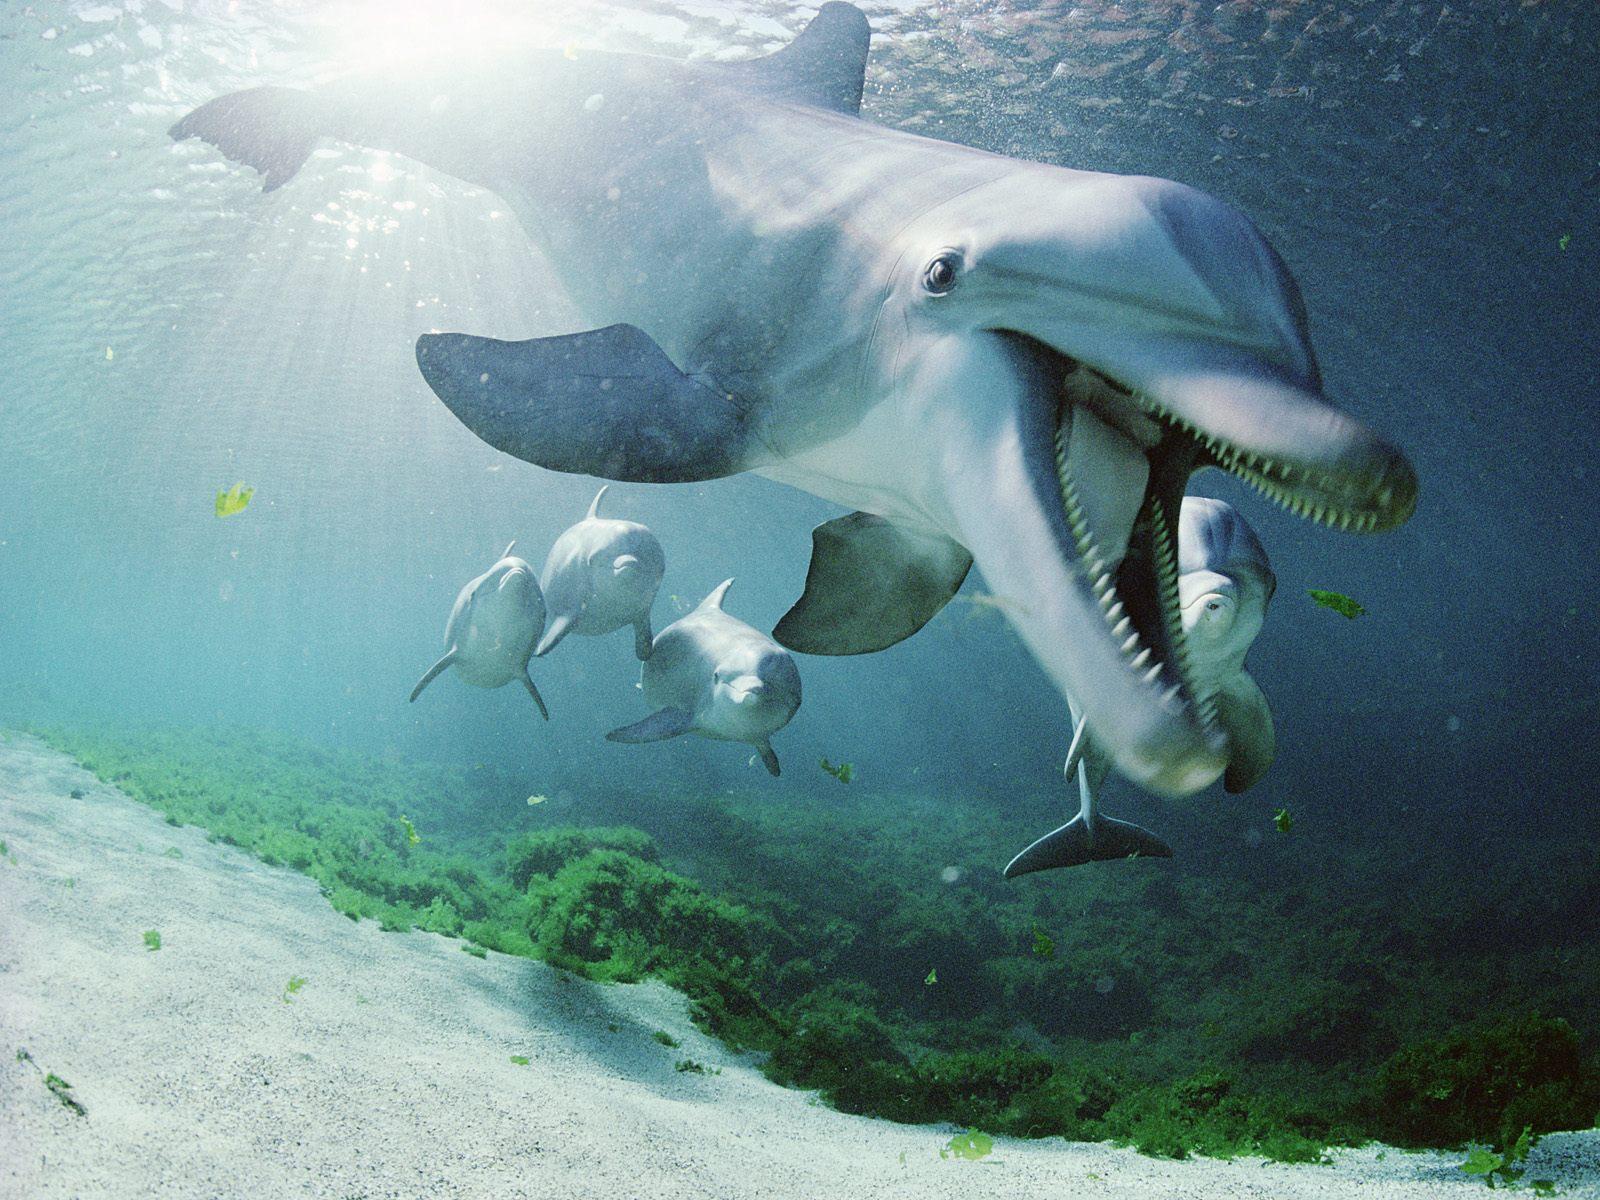 Bottlenose dolphins Full hd wallpapers